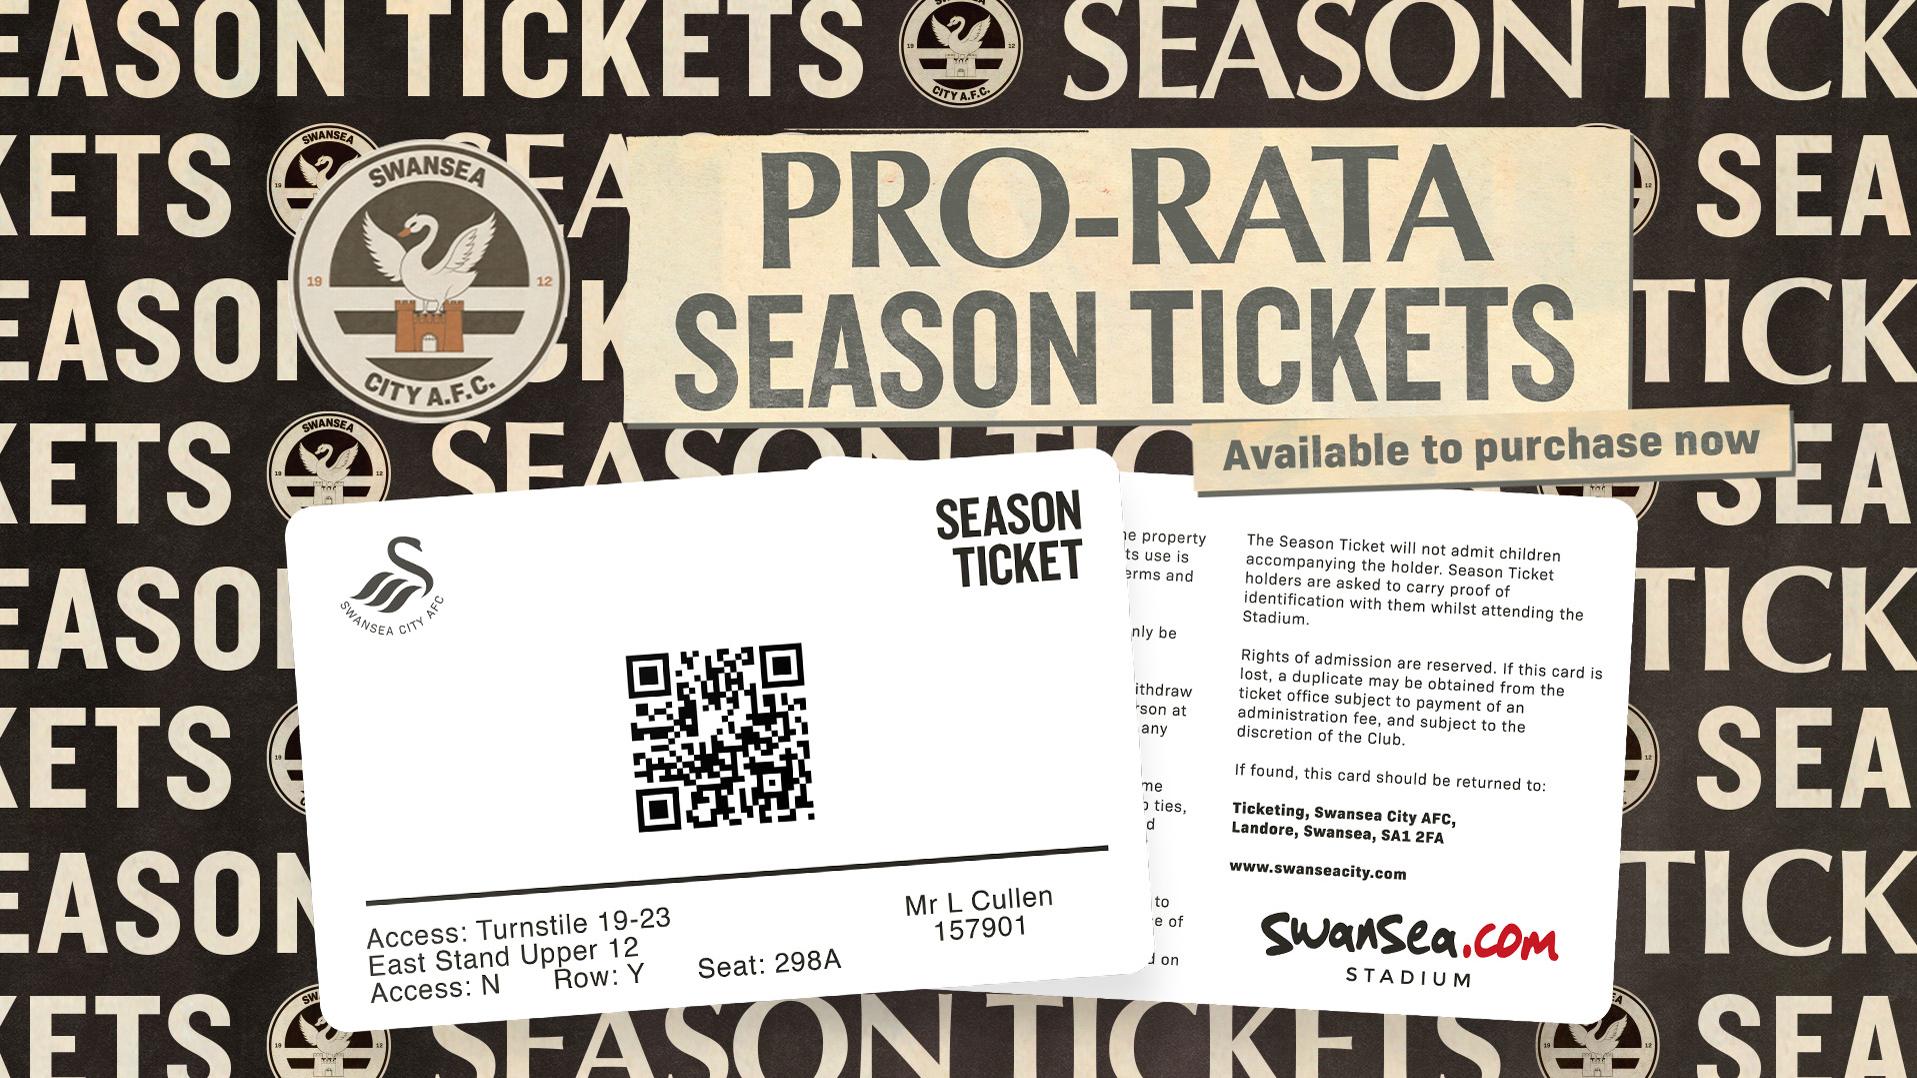 Pro-rata season ticket artwork